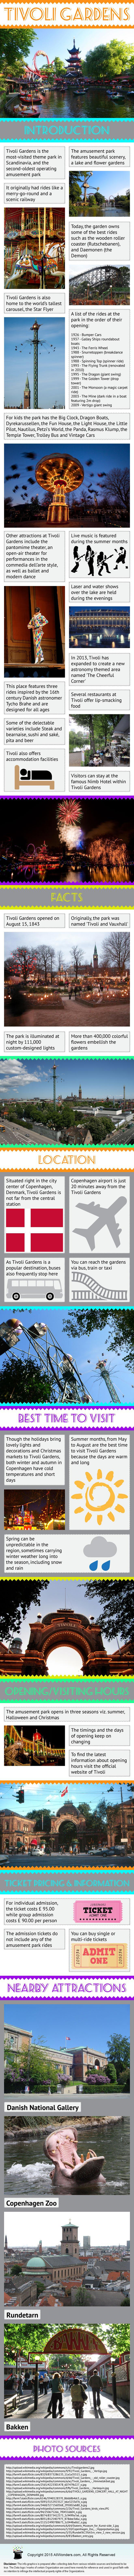 Tivoli Gardens Infographic